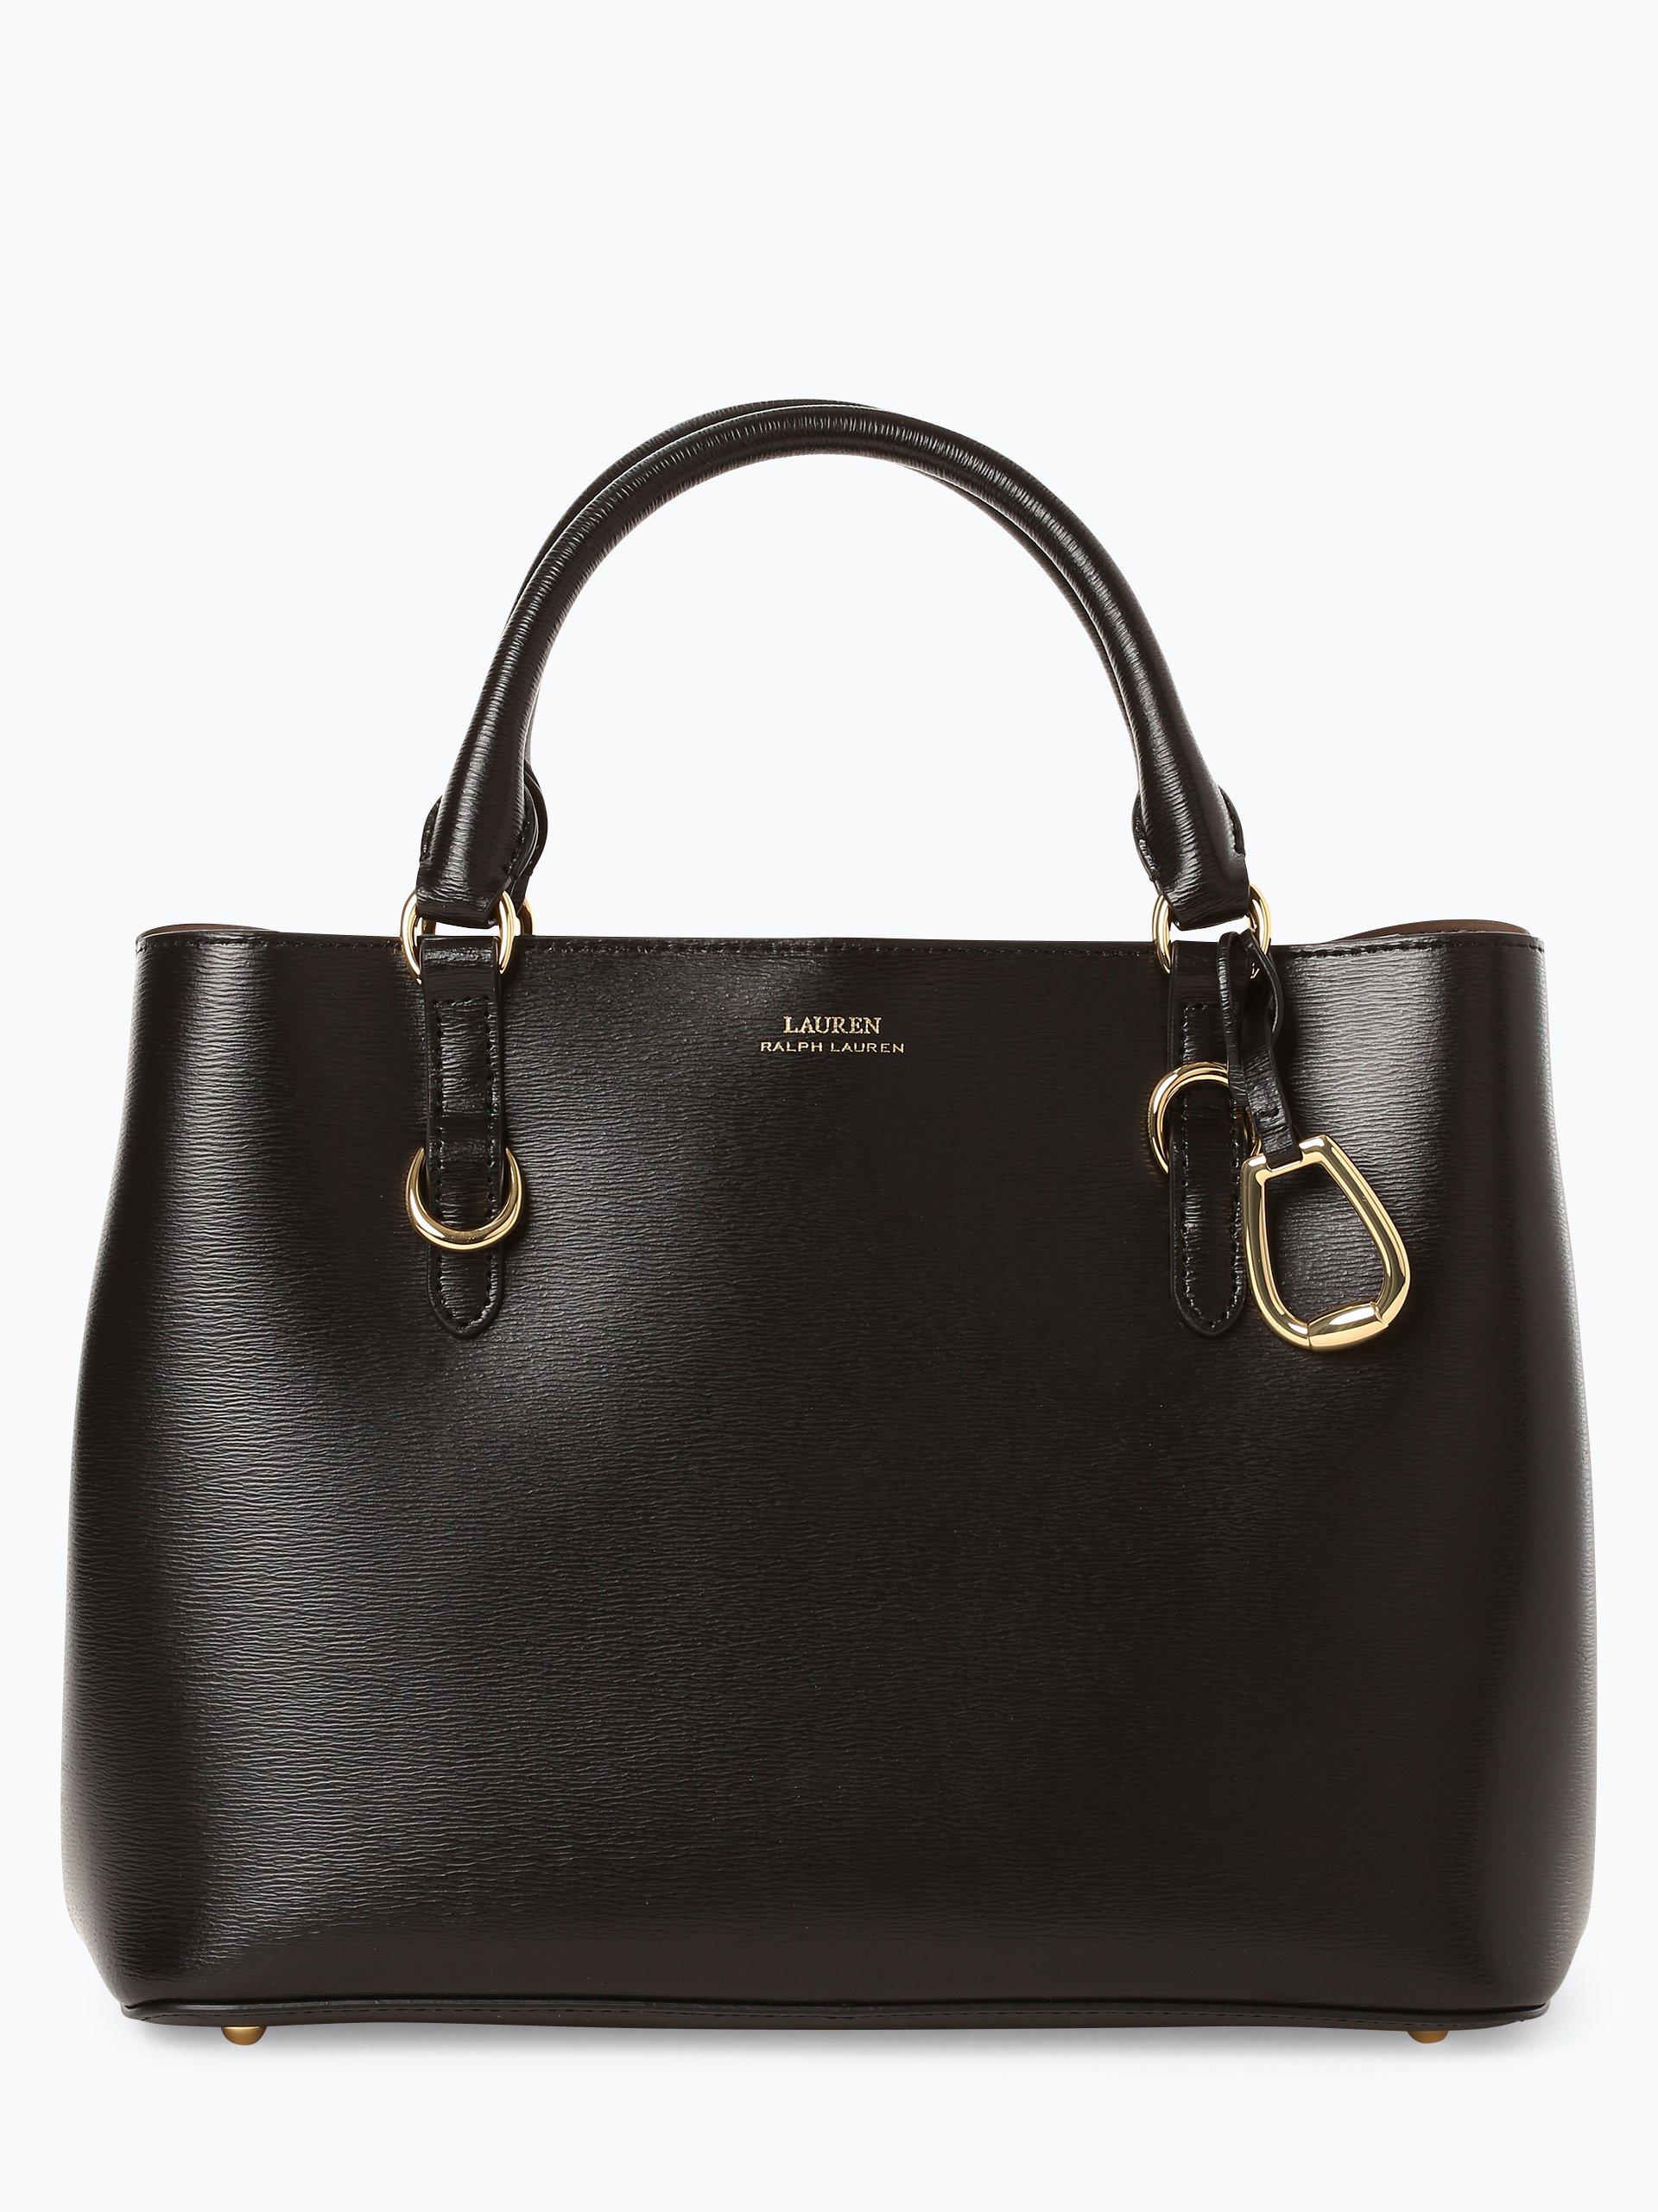 Lauren Ralph Lauren Damen Handtasche aus Leder - Bennington